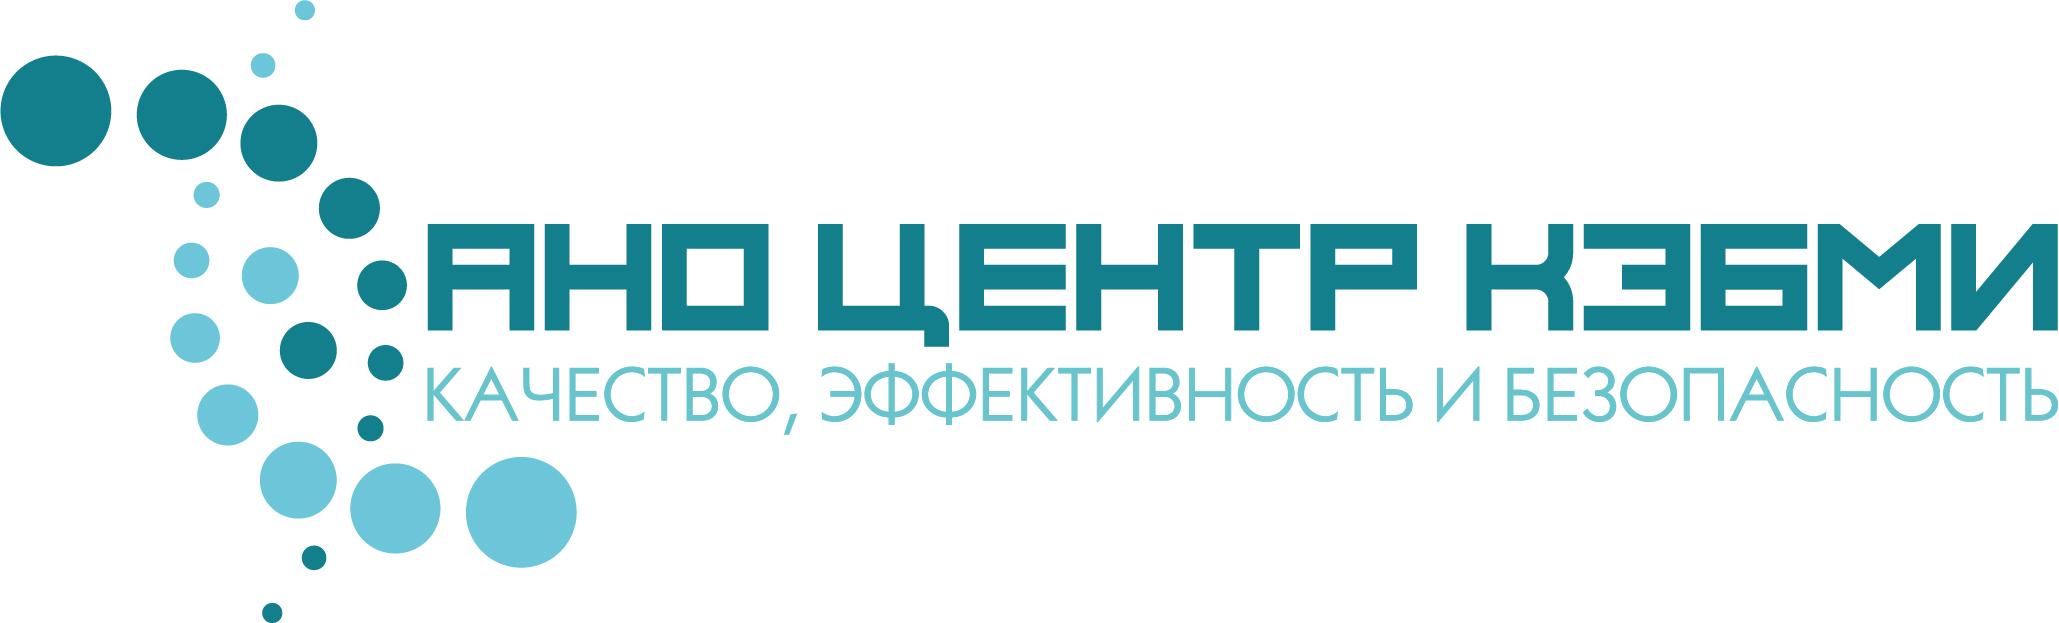 Редизайн логотипа АНО Центр КЭБМИ - BREVIS фото f_6385b1bbbaf77aa7.jpg